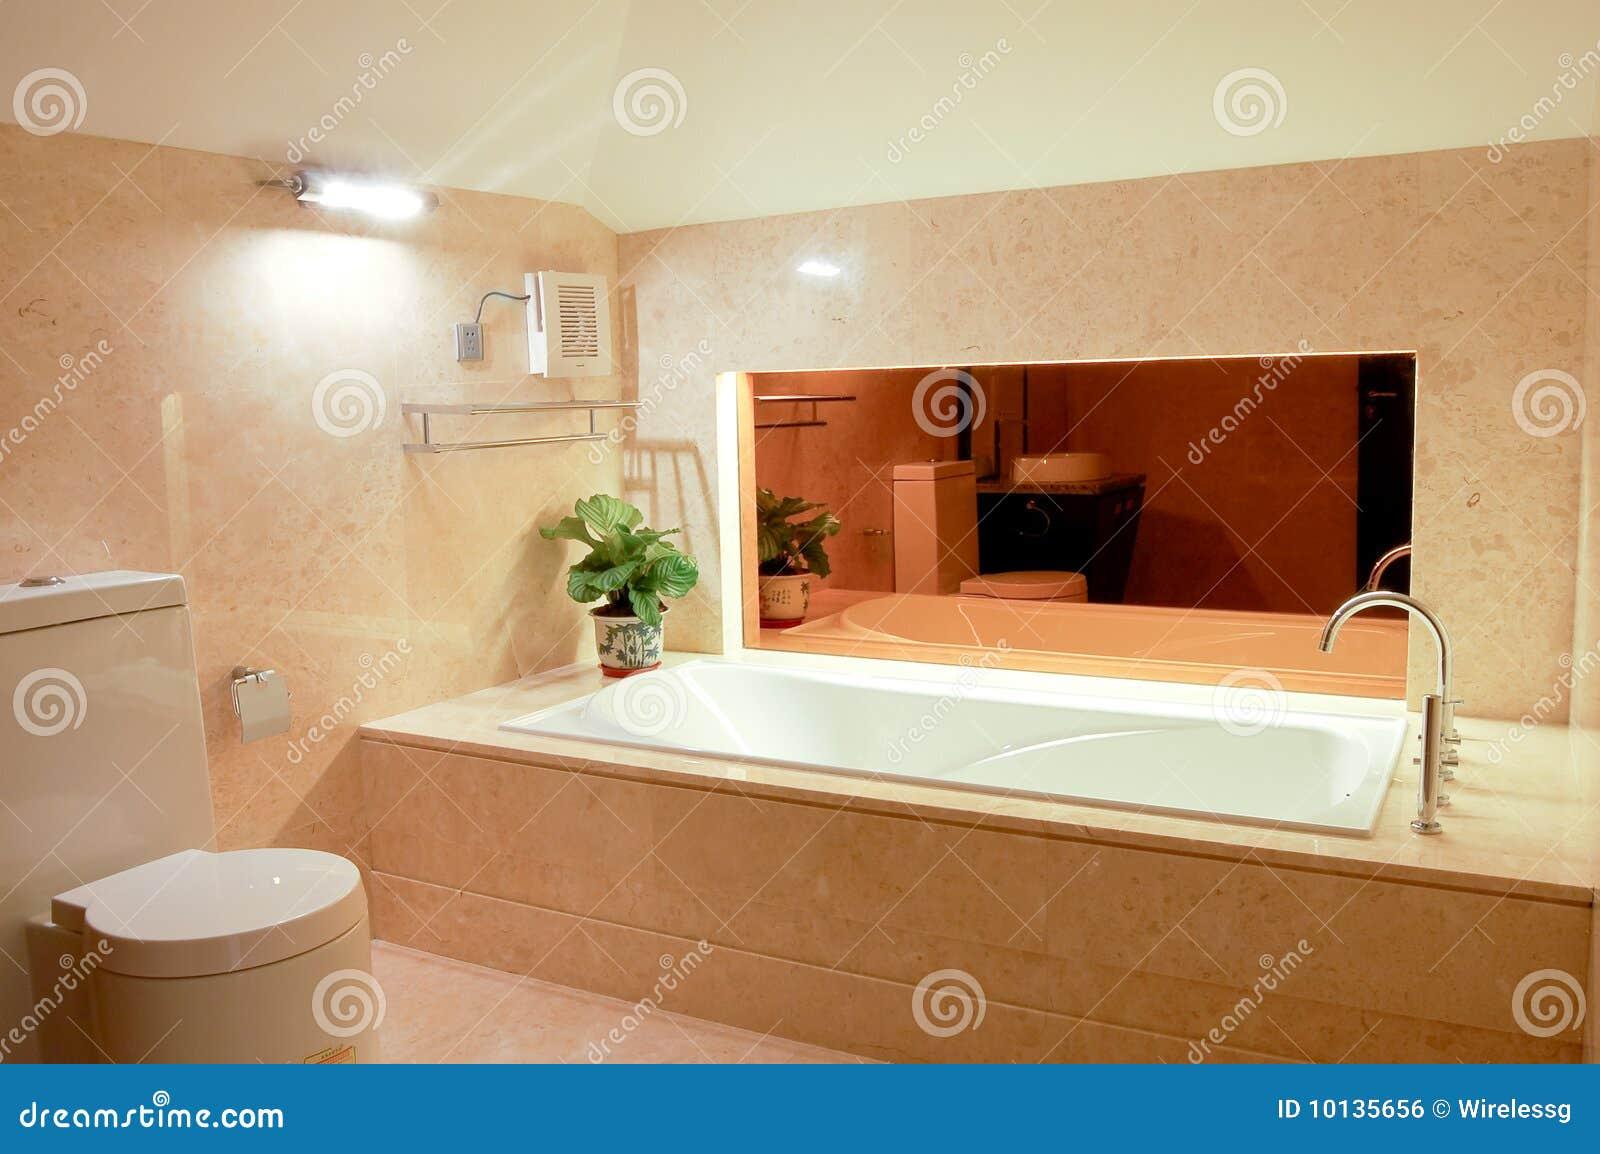 Washroom with big bathtub stock photo. Image of hotel - 10135656